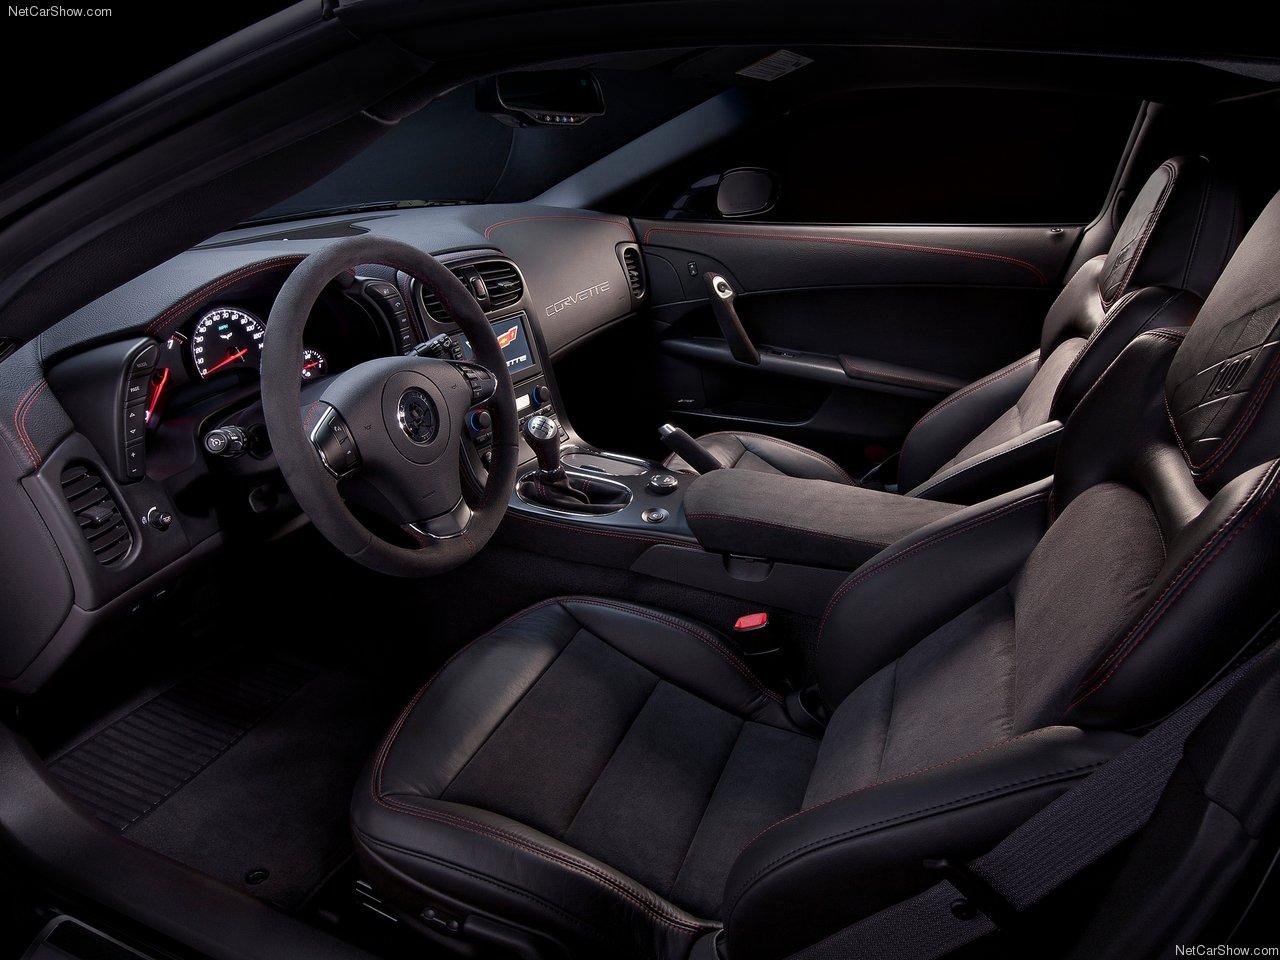 ... twenty-first century: 2012 Chevrolet Corvette Z06 Centennial Edition